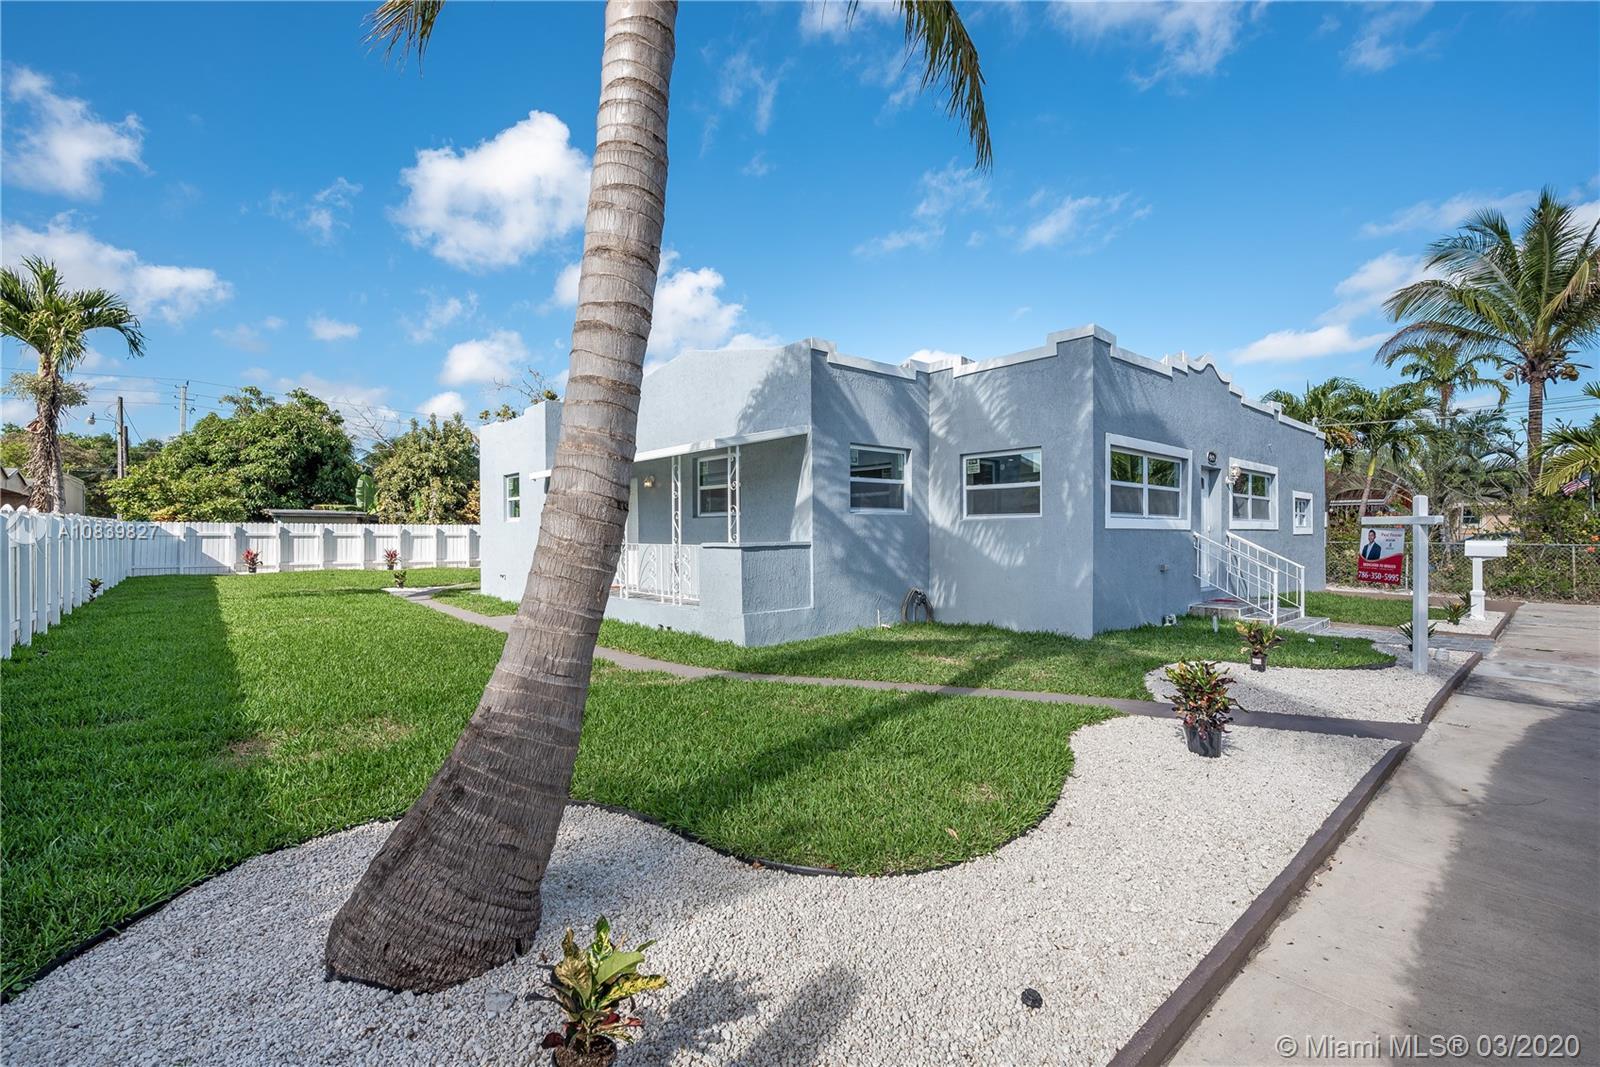 469 NE 130th St, Miami Shores, Florida